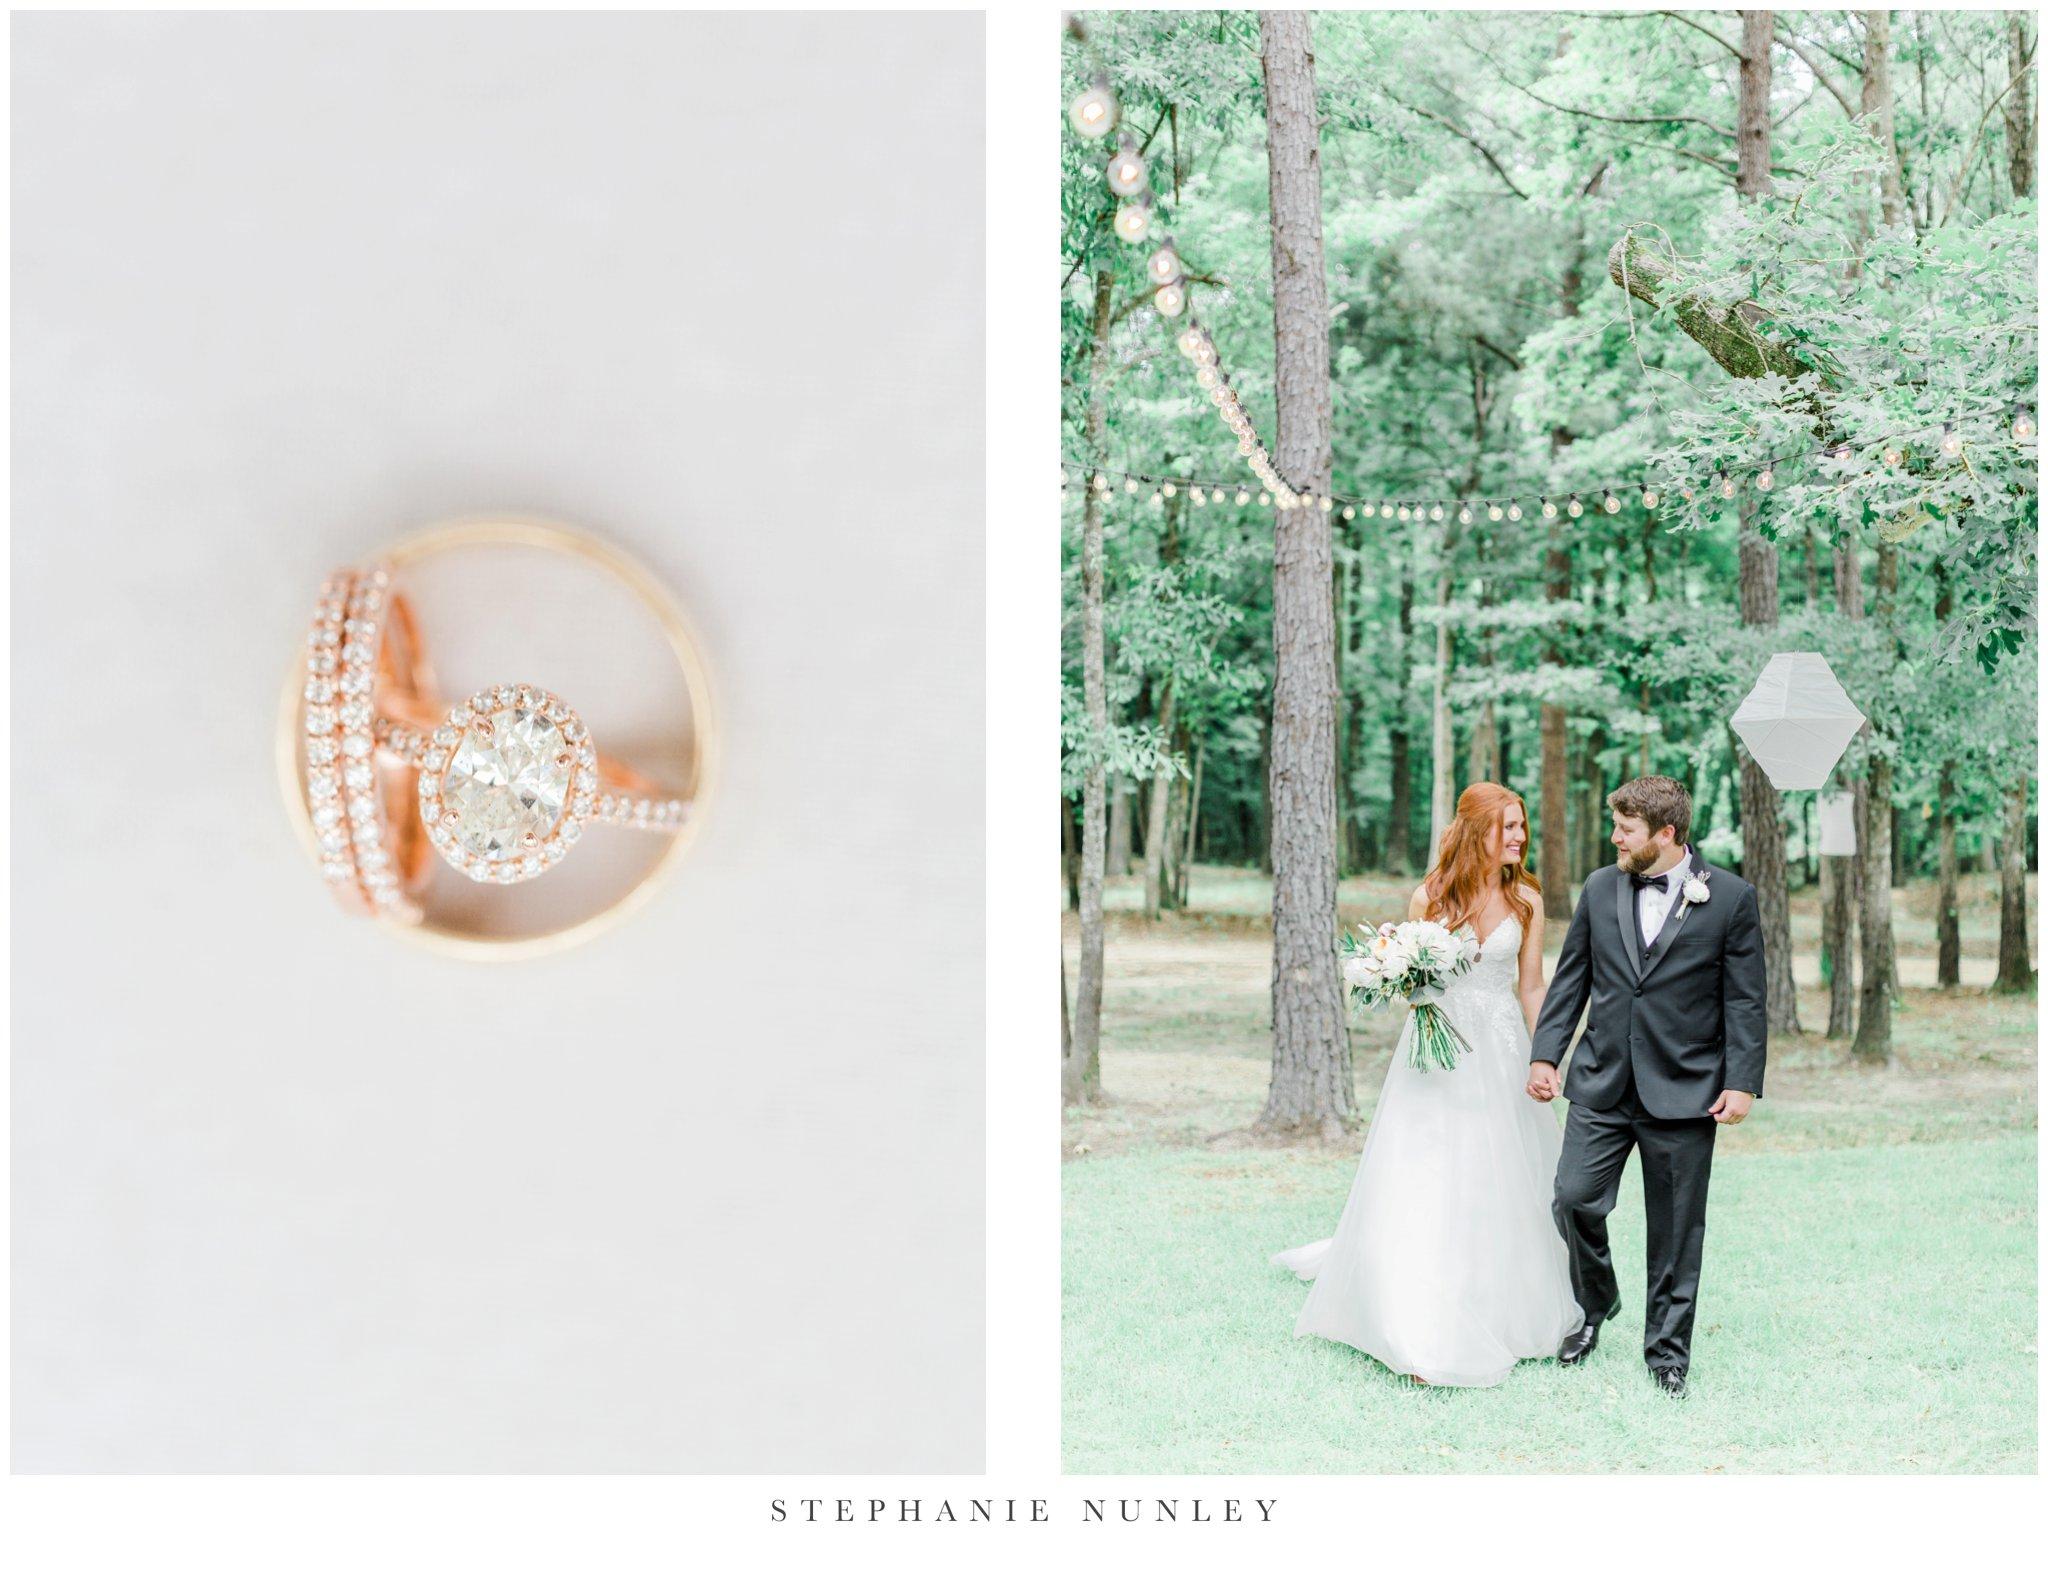 blessing-tree-farm-arkansas-wedding-0014.jpg